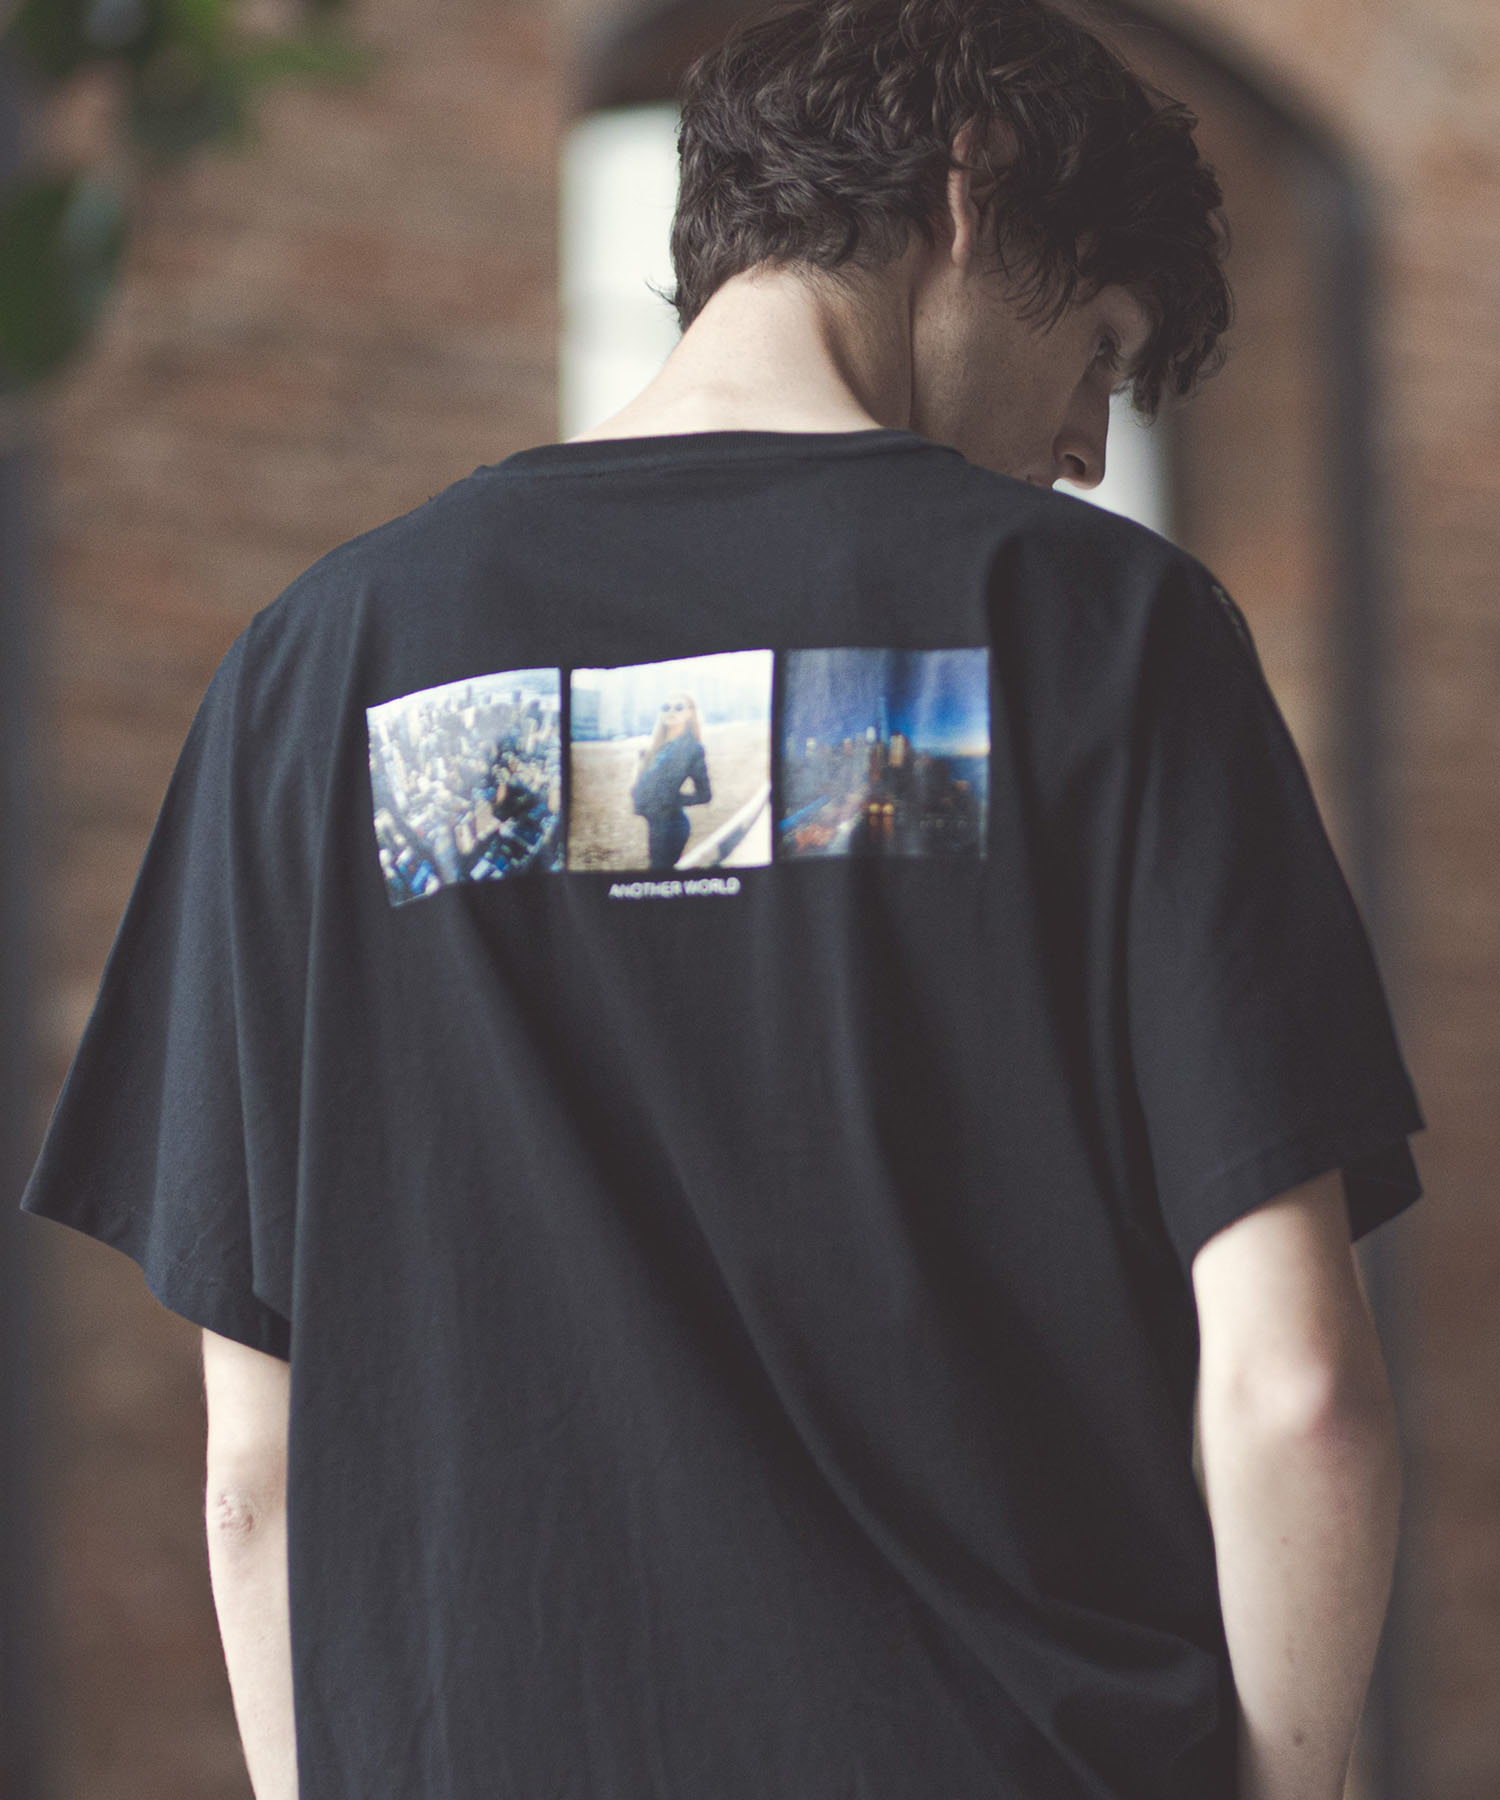 【GLIMCLAP(グリムクラップ)】Dolman sleeve Design Print T-Shirt Tシャツ(020gls-ca)